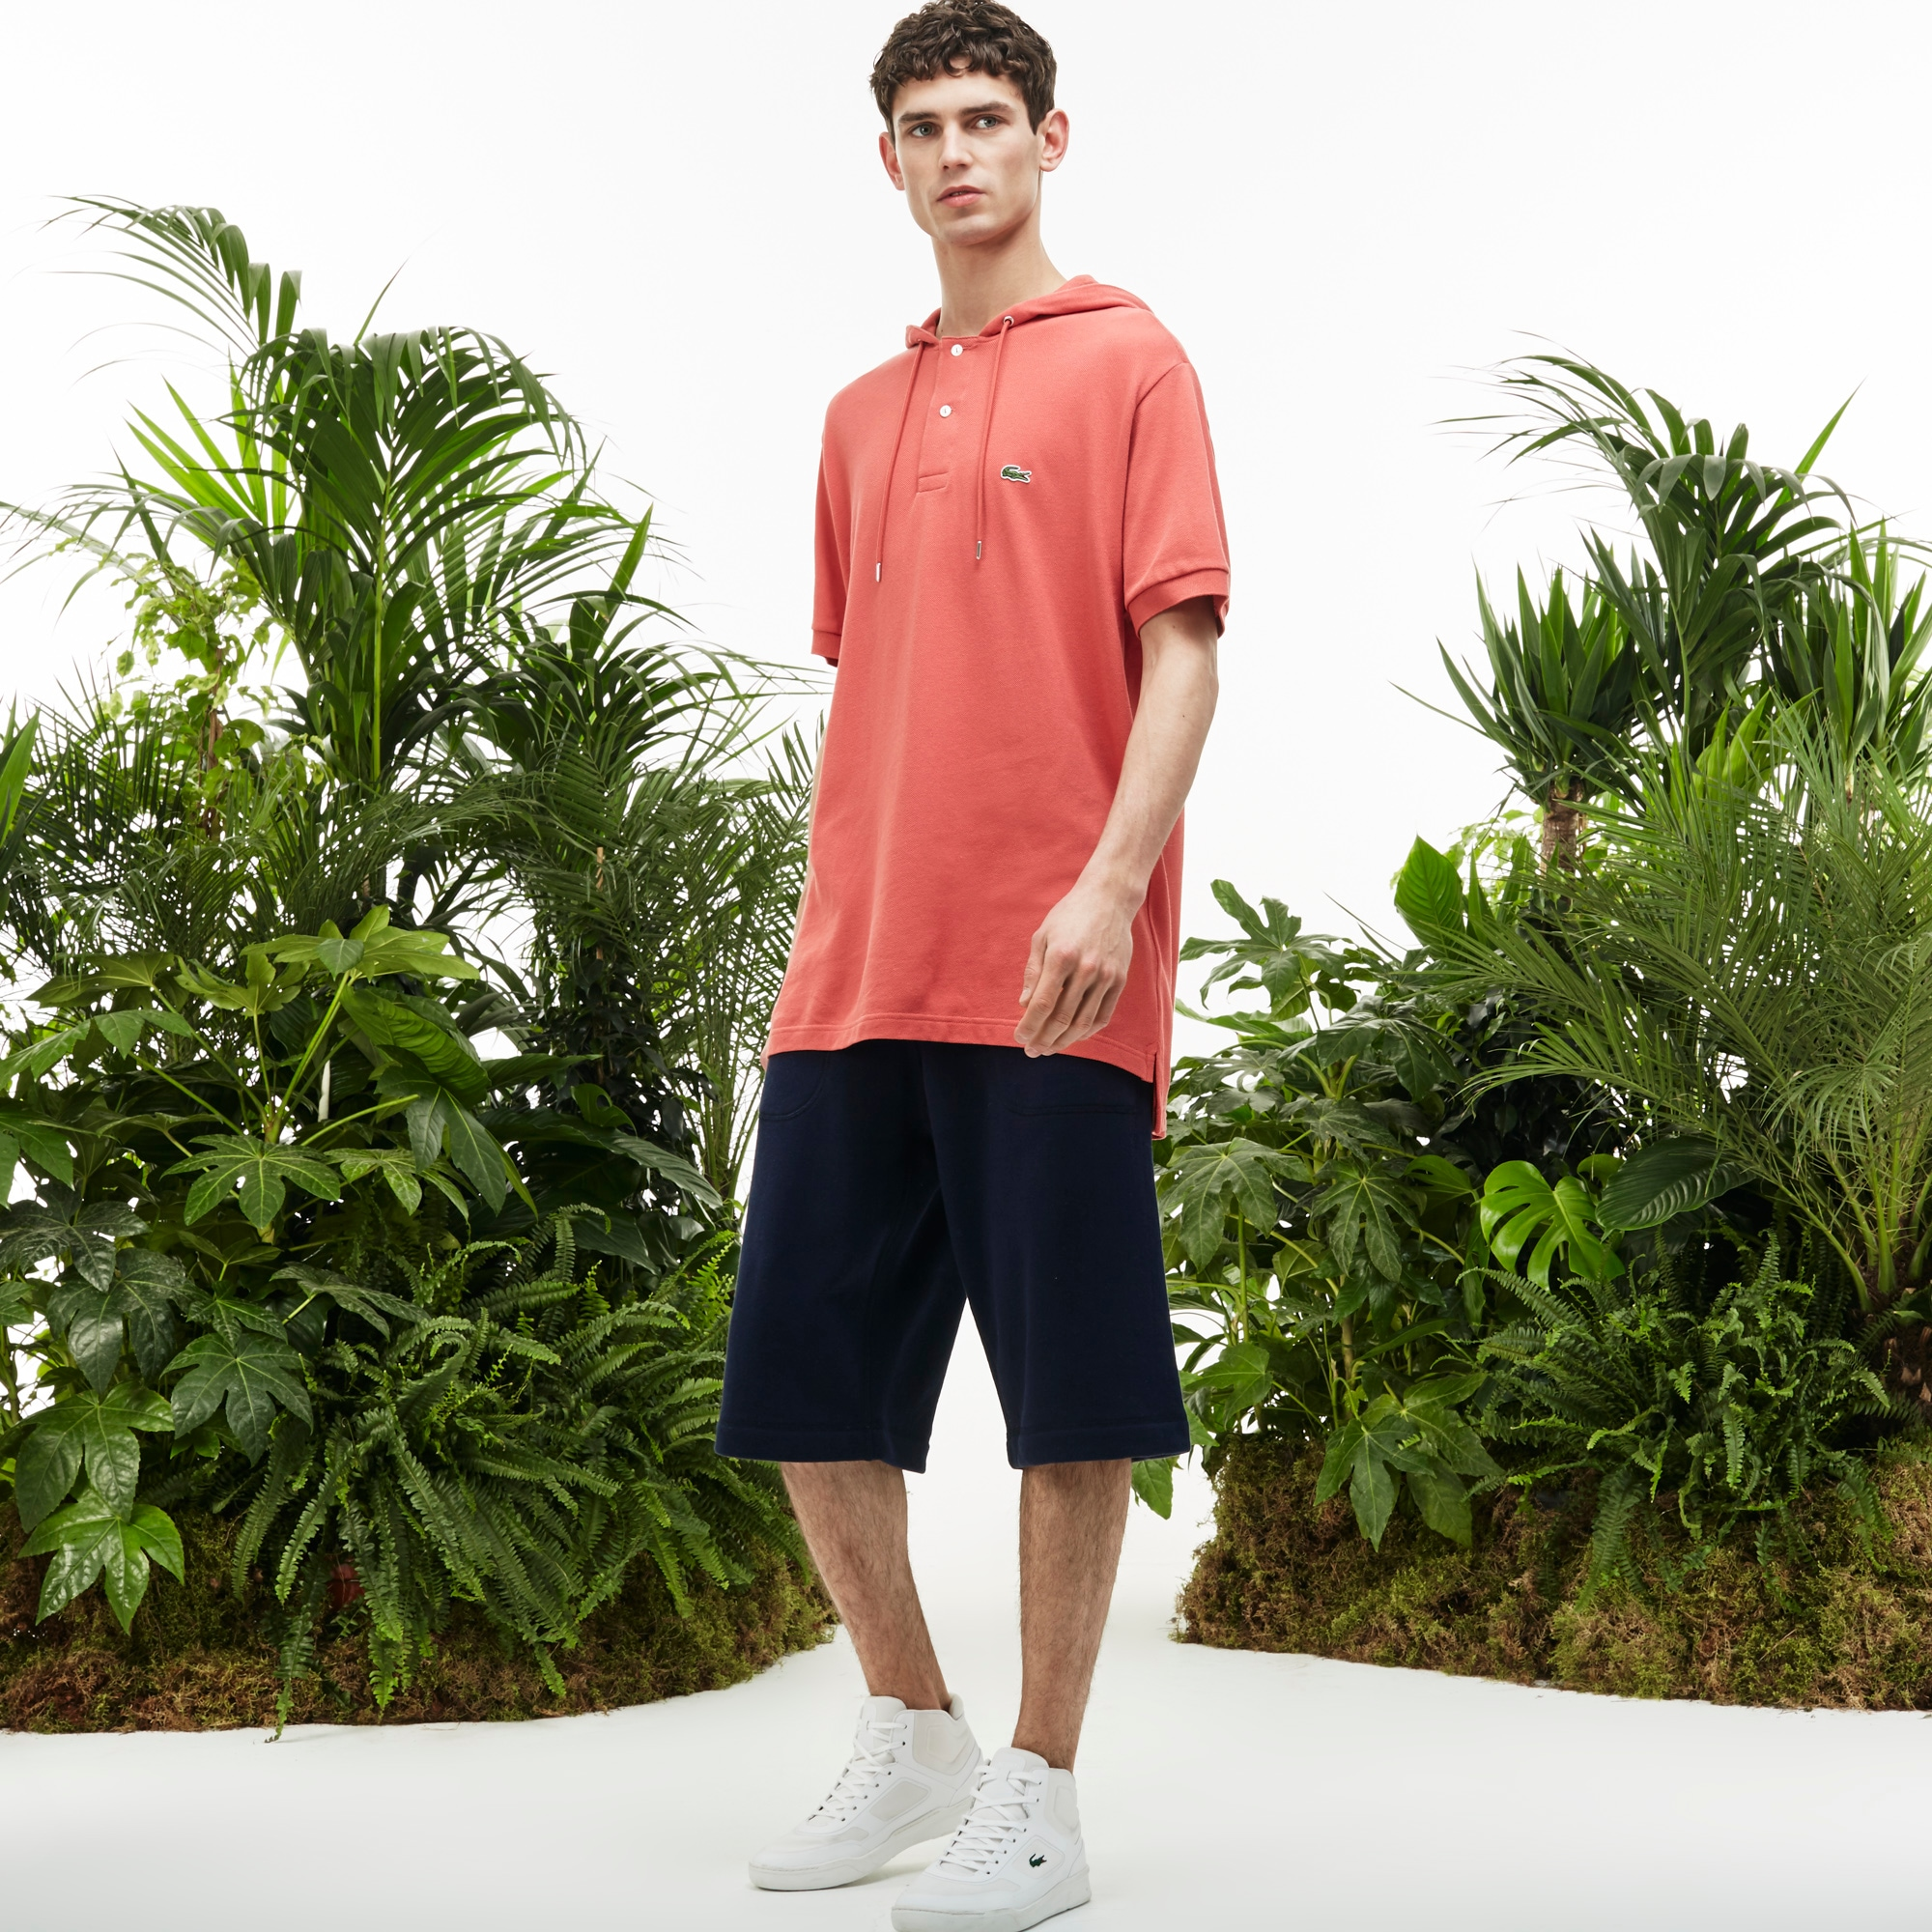 Men's Fashion Show Fleece Bermudas